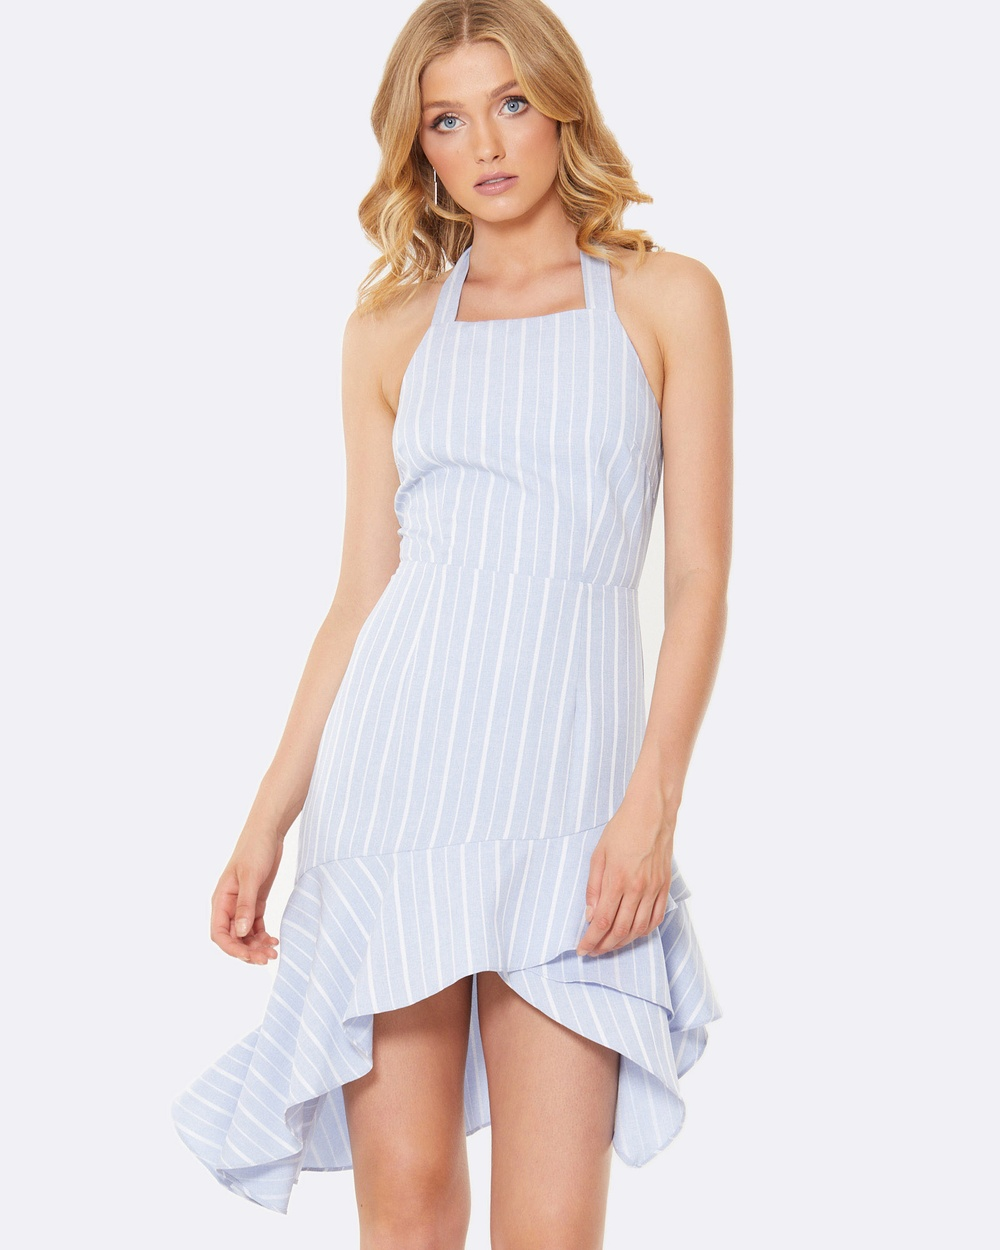 Calli Selena Frill Dress Dresses Blue Selena Frill Dress